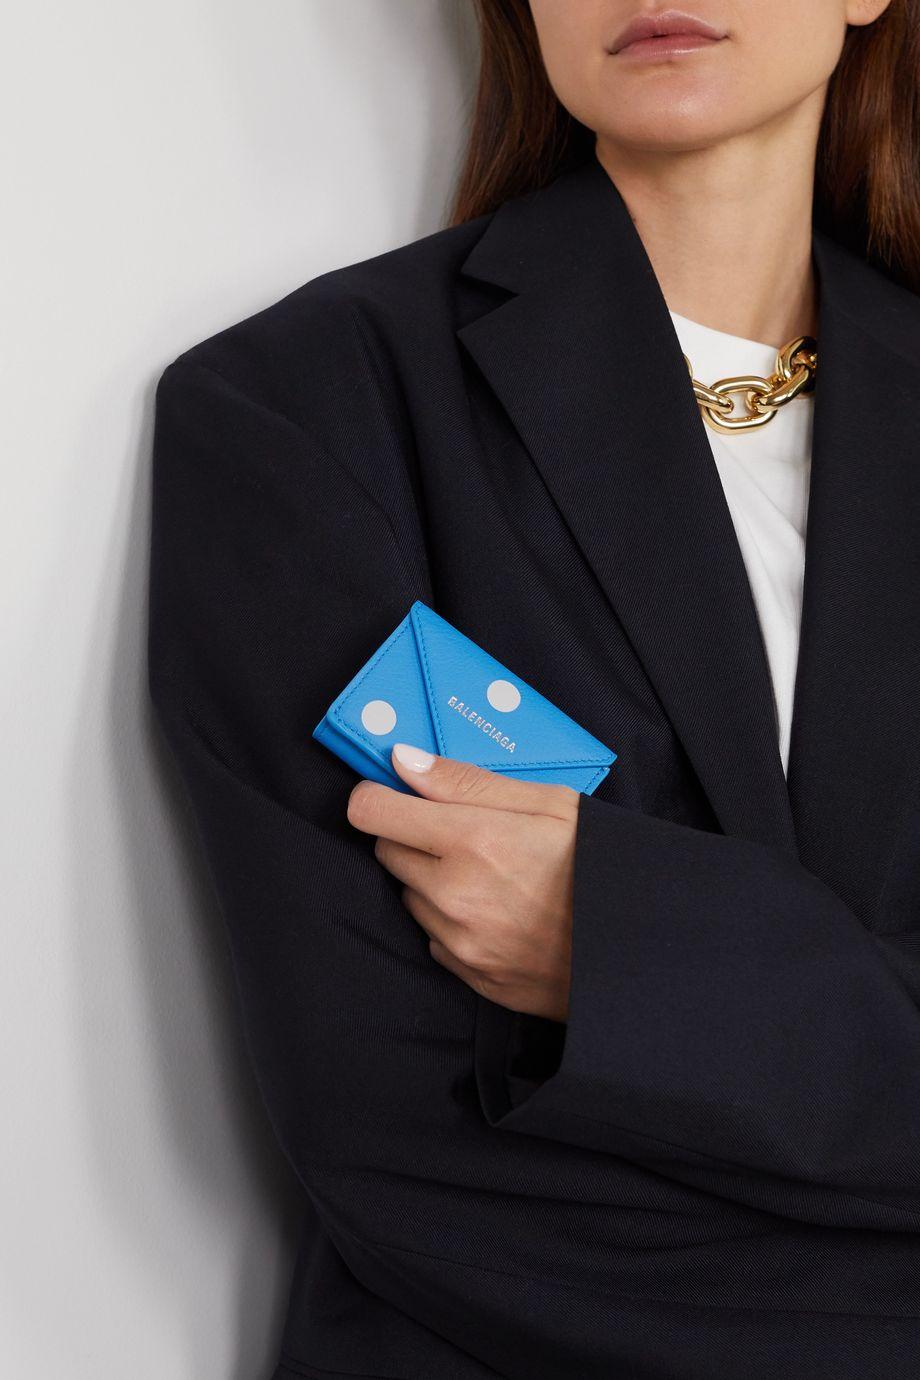 Balenciaga Papier mini bedrucktes Portemonnaie aus strukturiertem Leder mit Polka-Dots